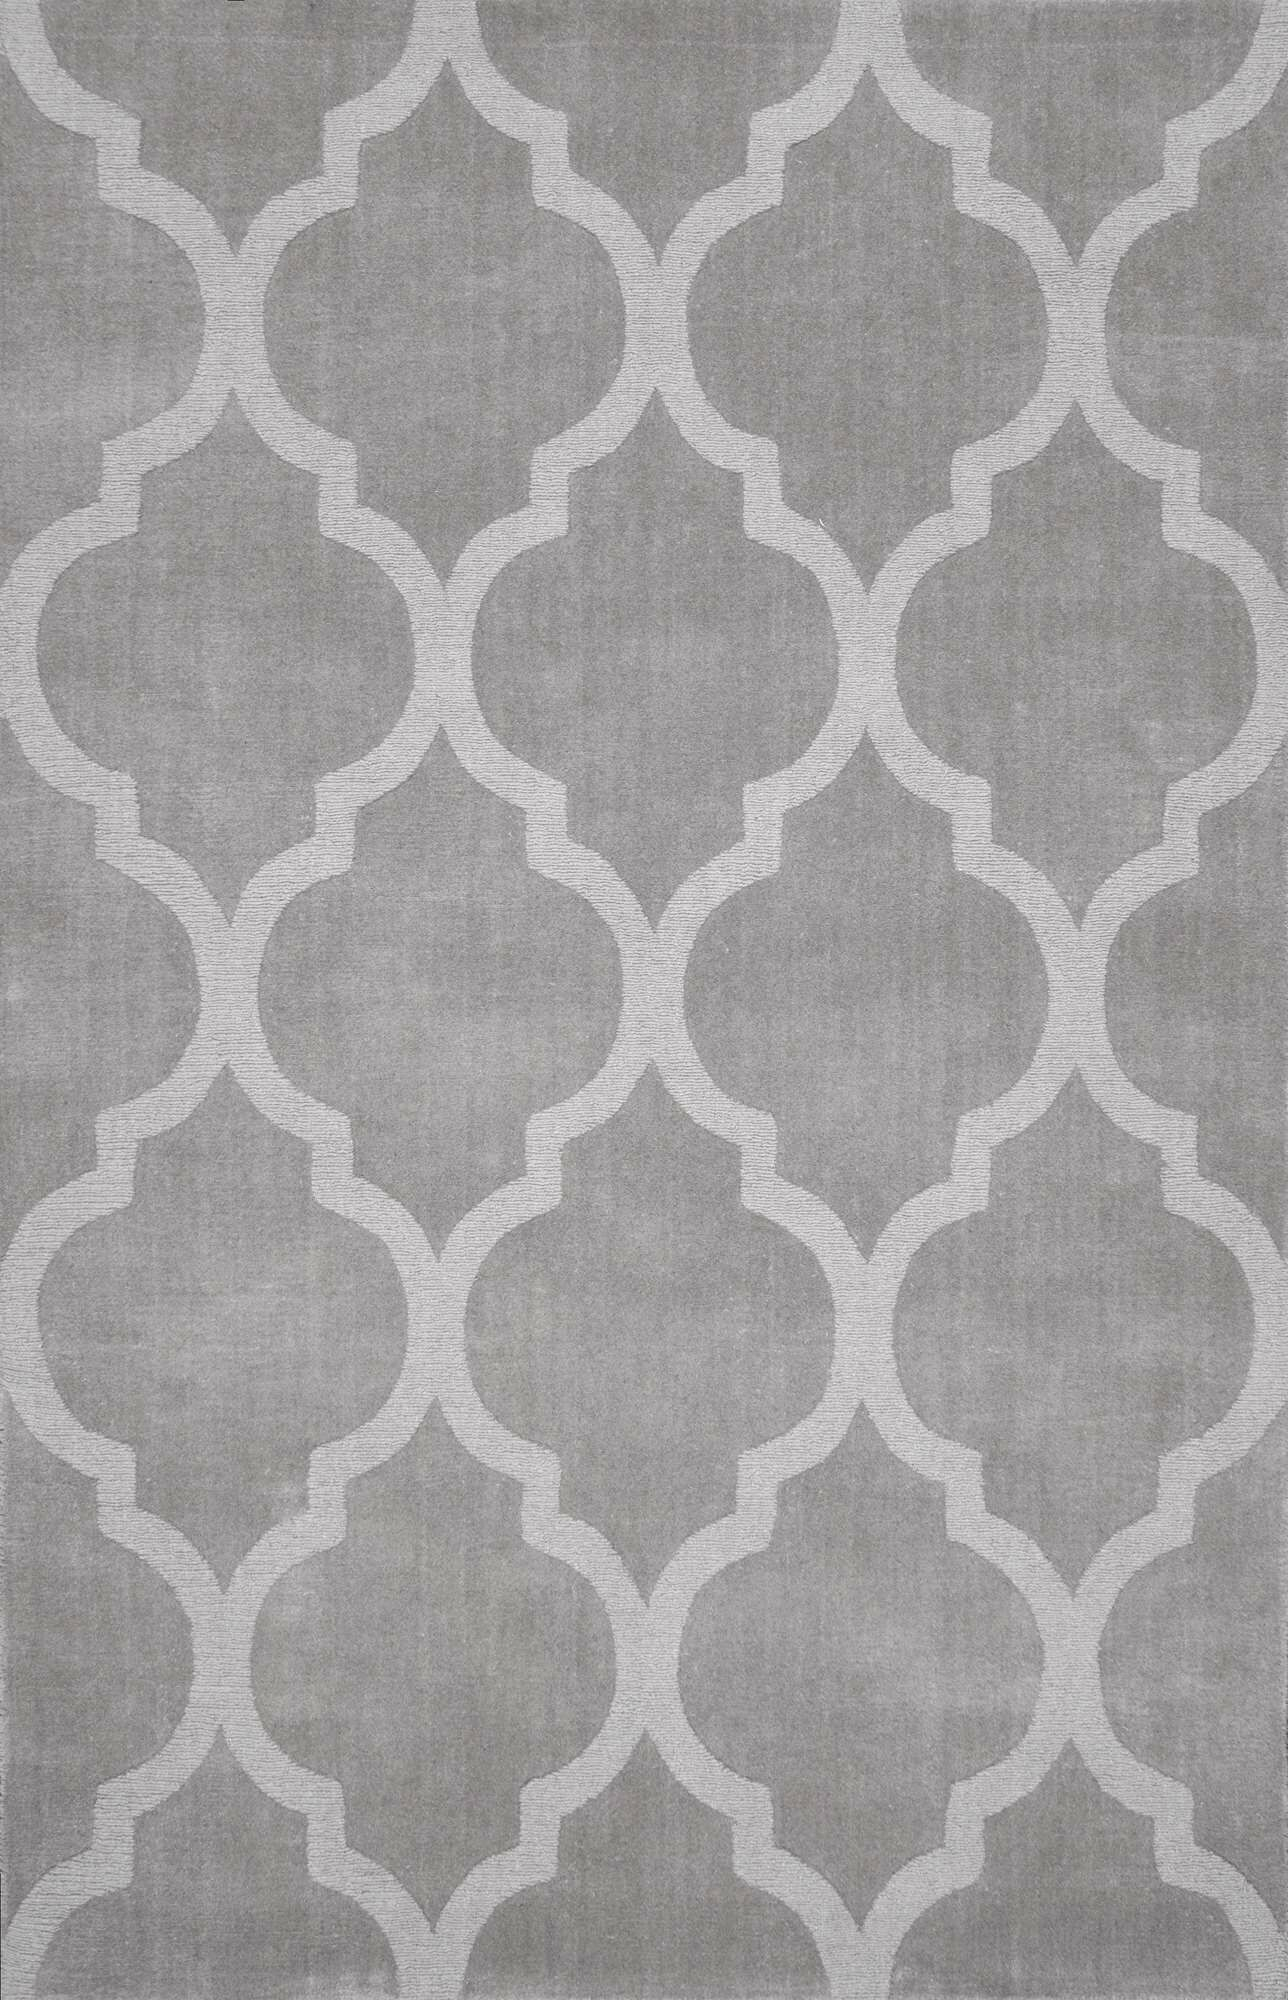 Cherelle Hand-Woven Dark Gray Area Rug Rug Size: Rectangle 7'6